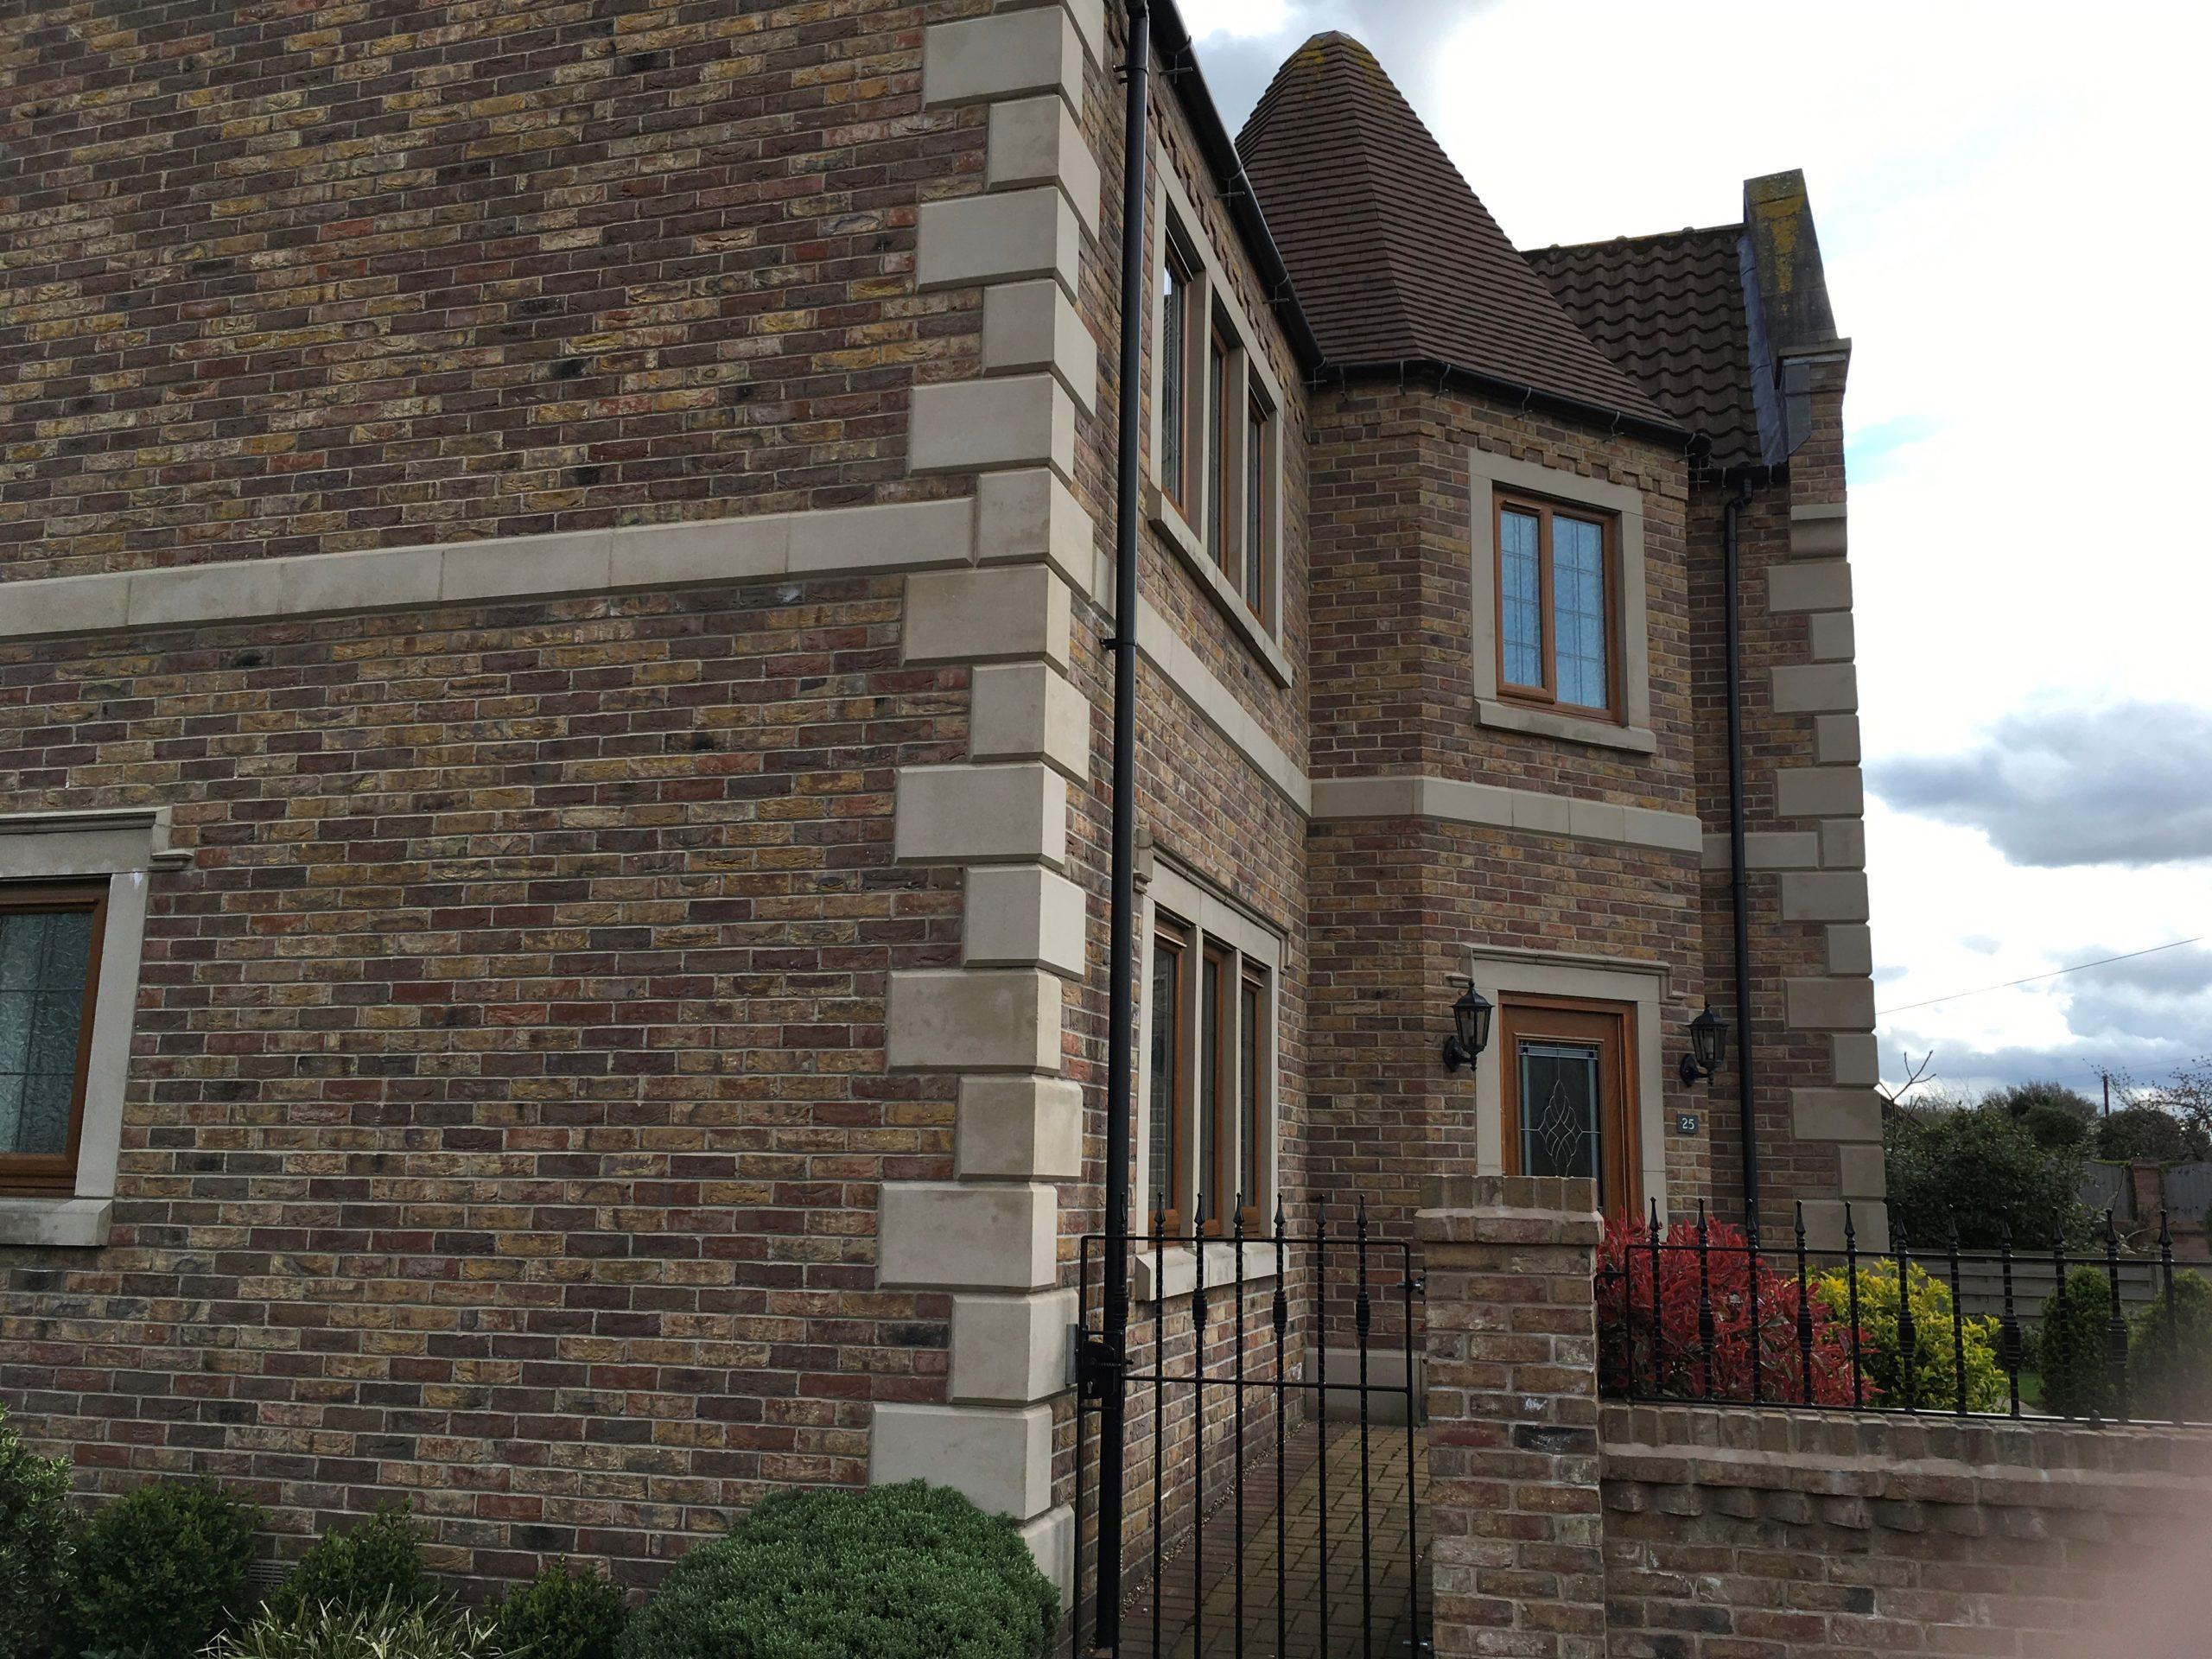 Multi blend bricks and stone quoins